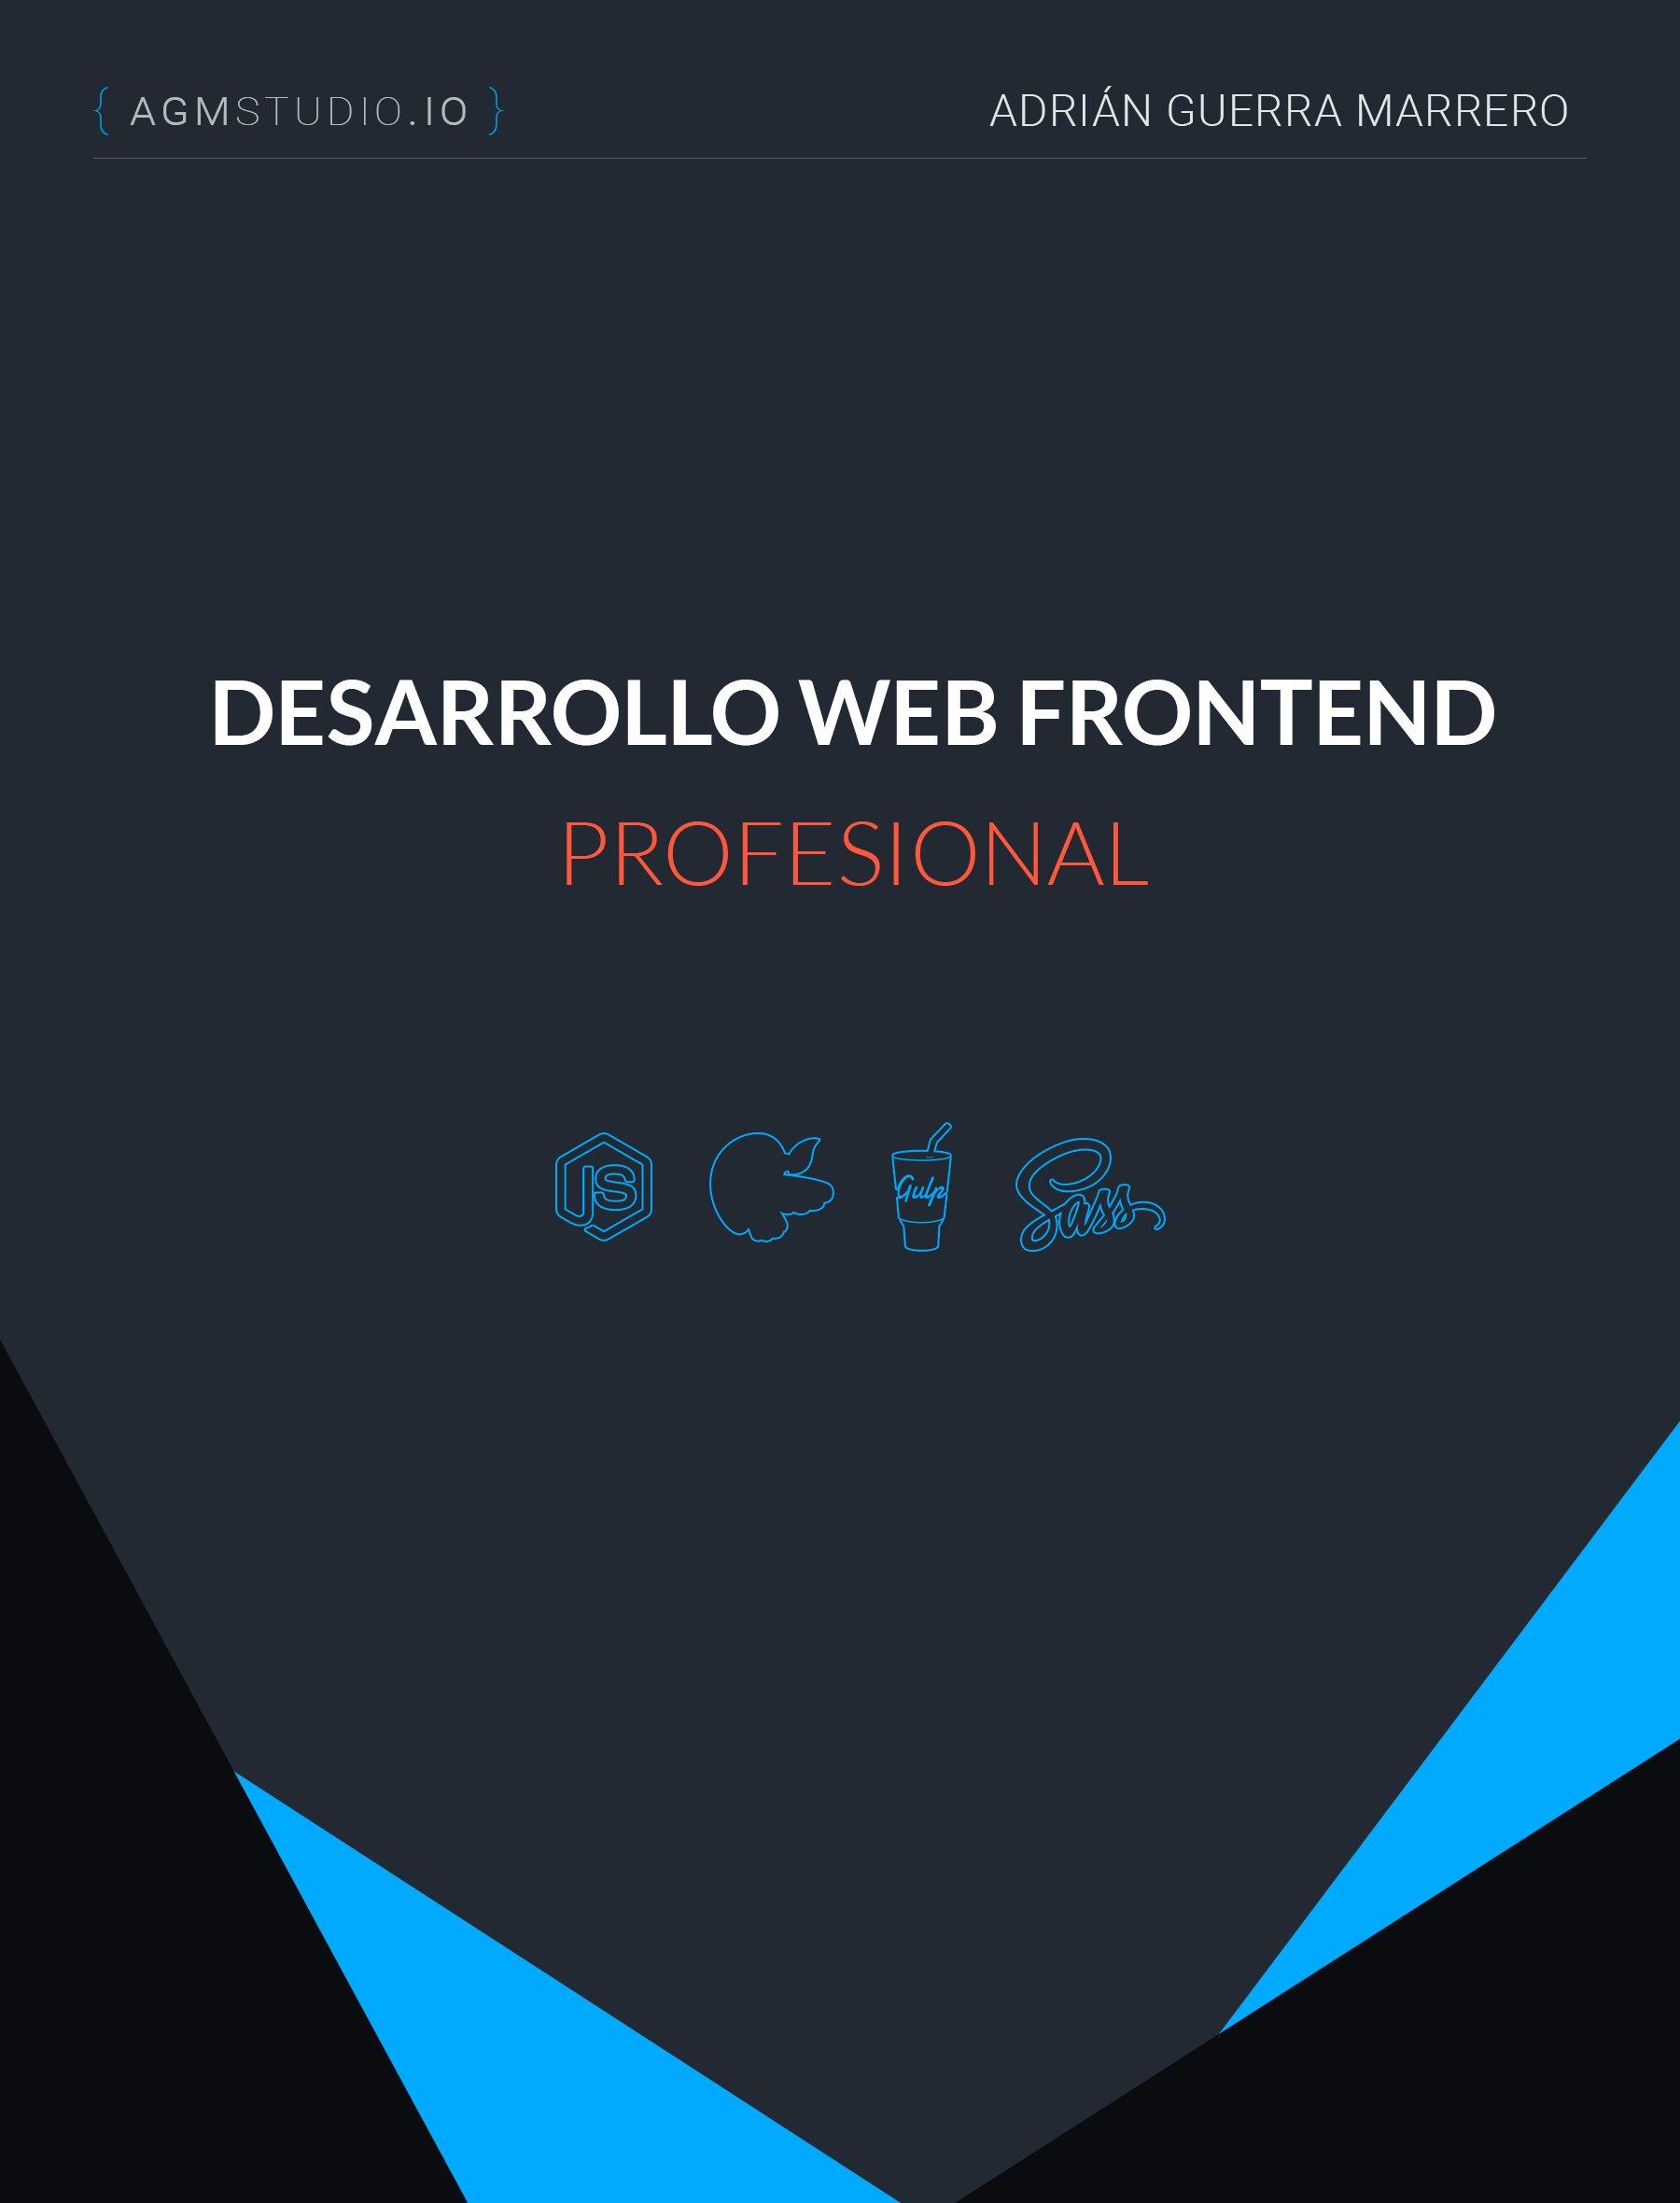 Desarrollo Web Frontend Profesional: Automatiza tareas con NodeJS, Bower, Gulp y SASS